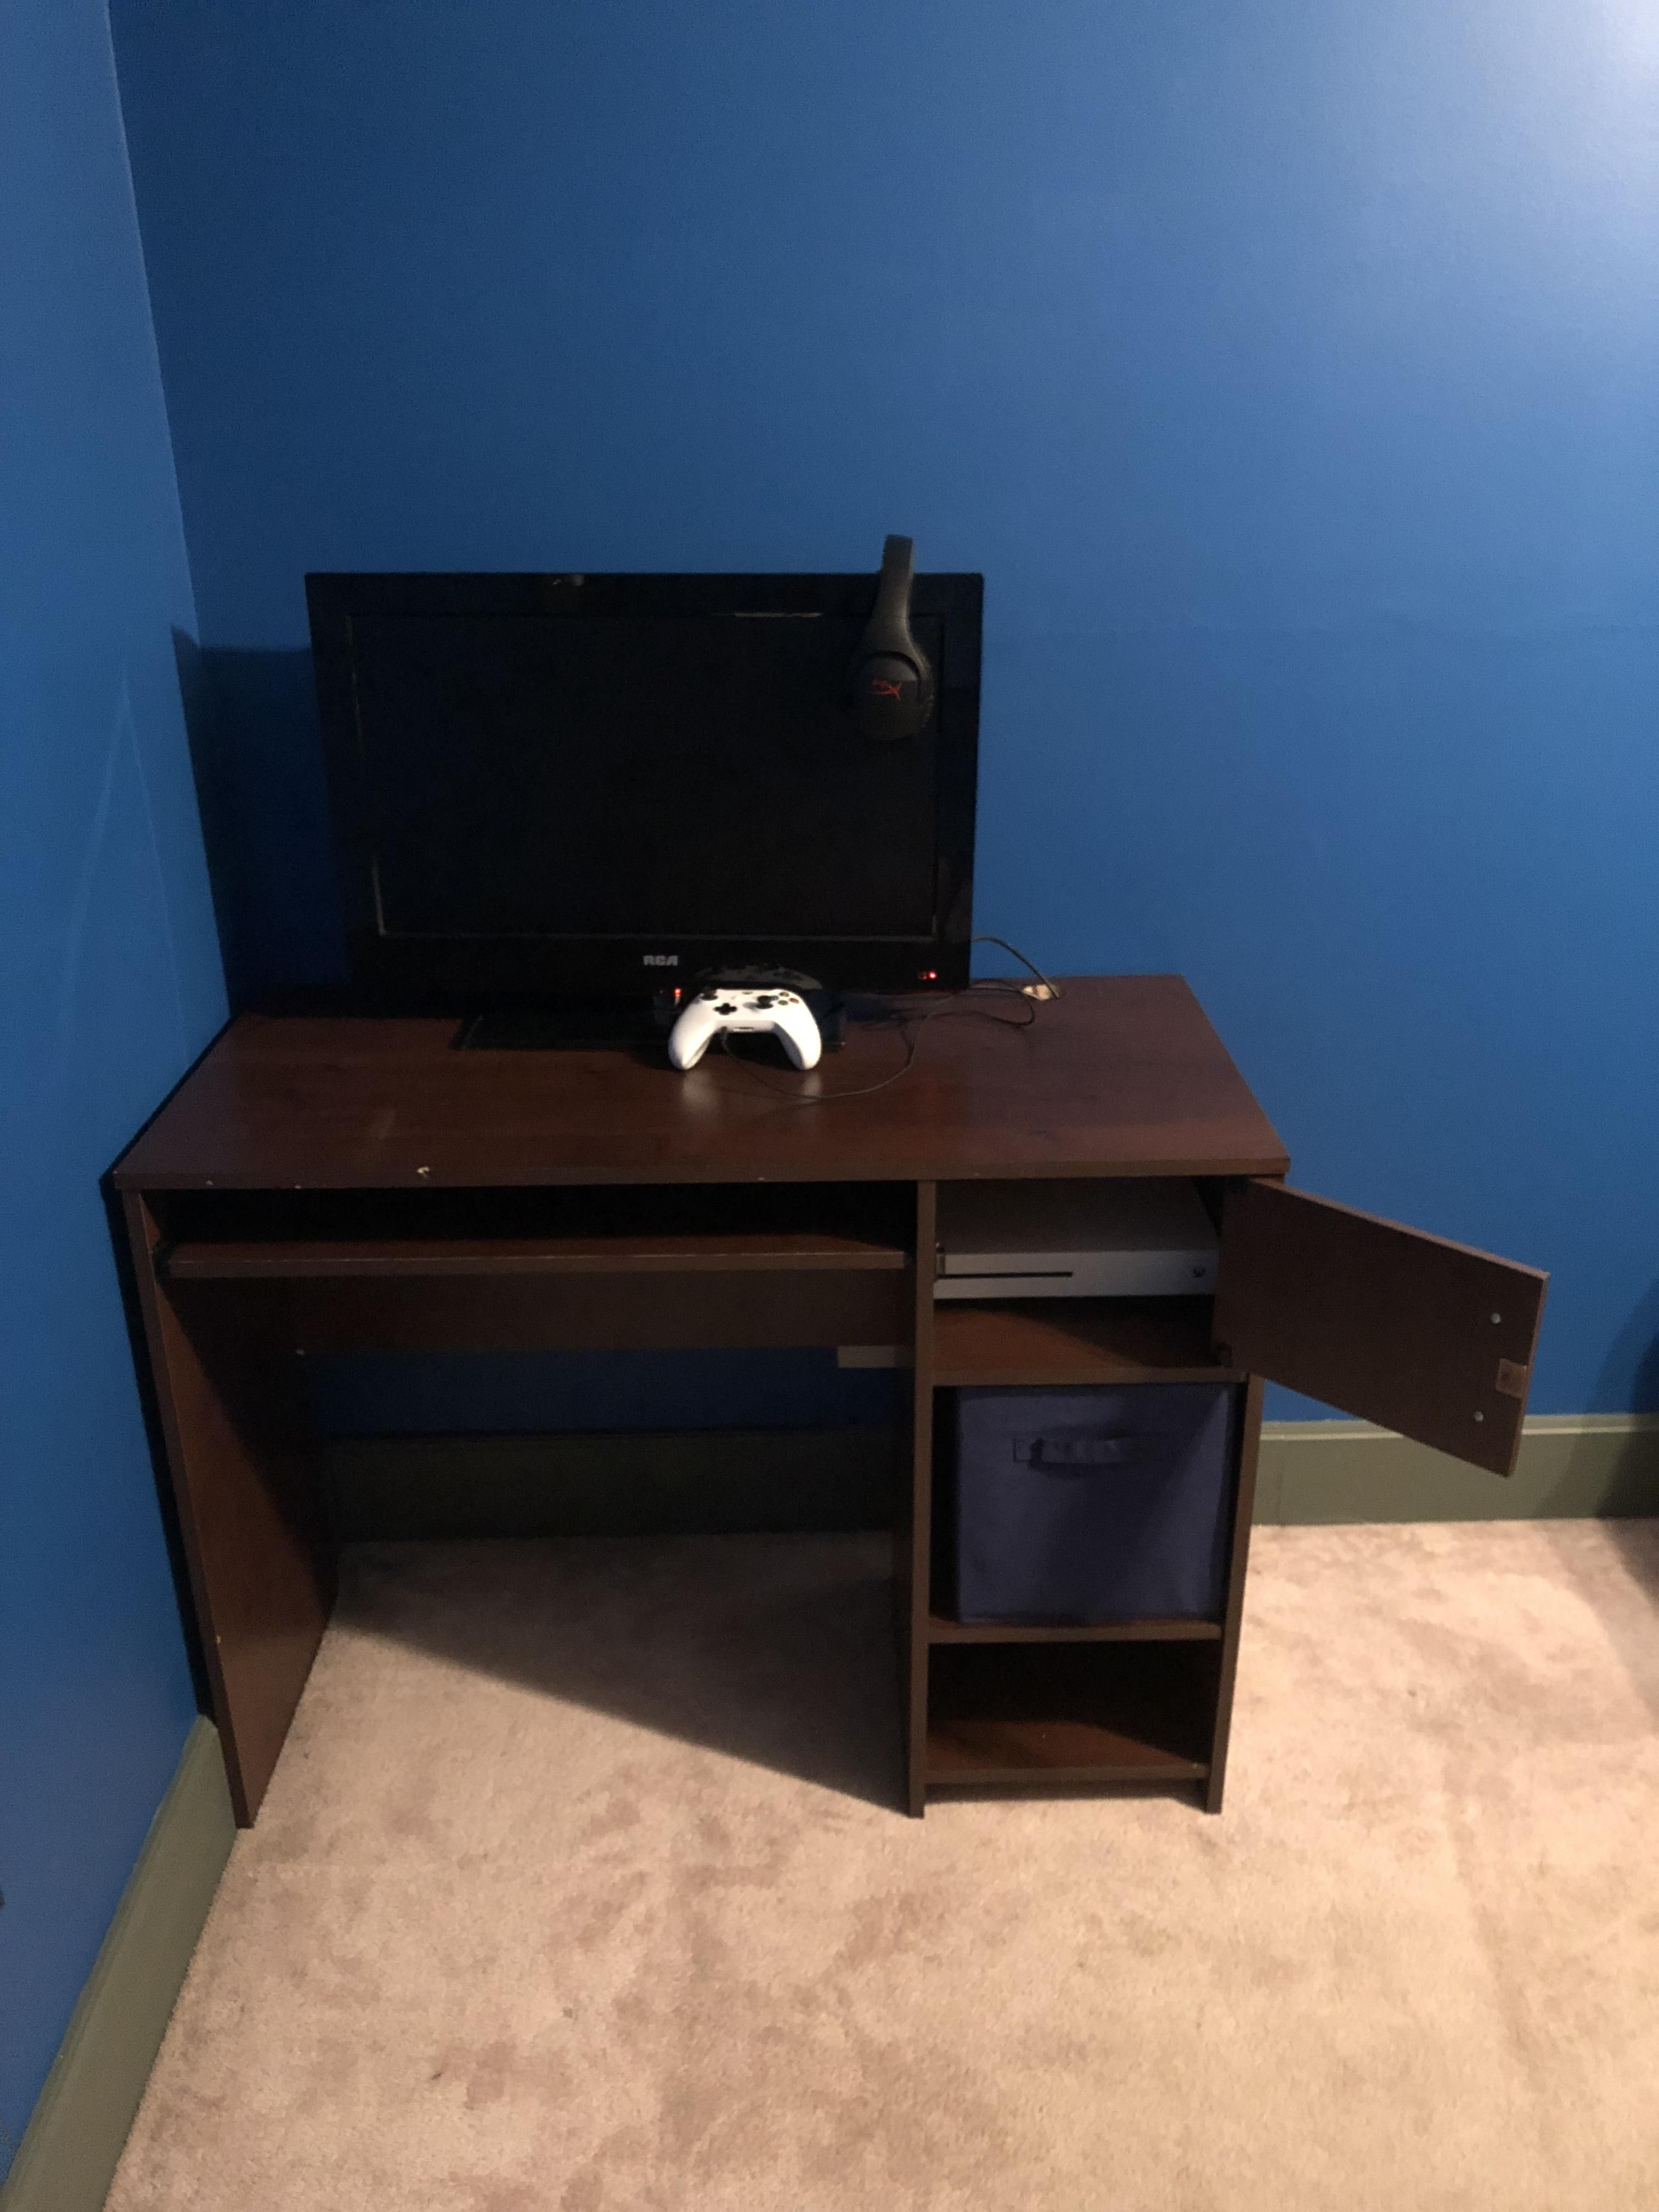 My First Battlestation Battlestation, Desk, Decor